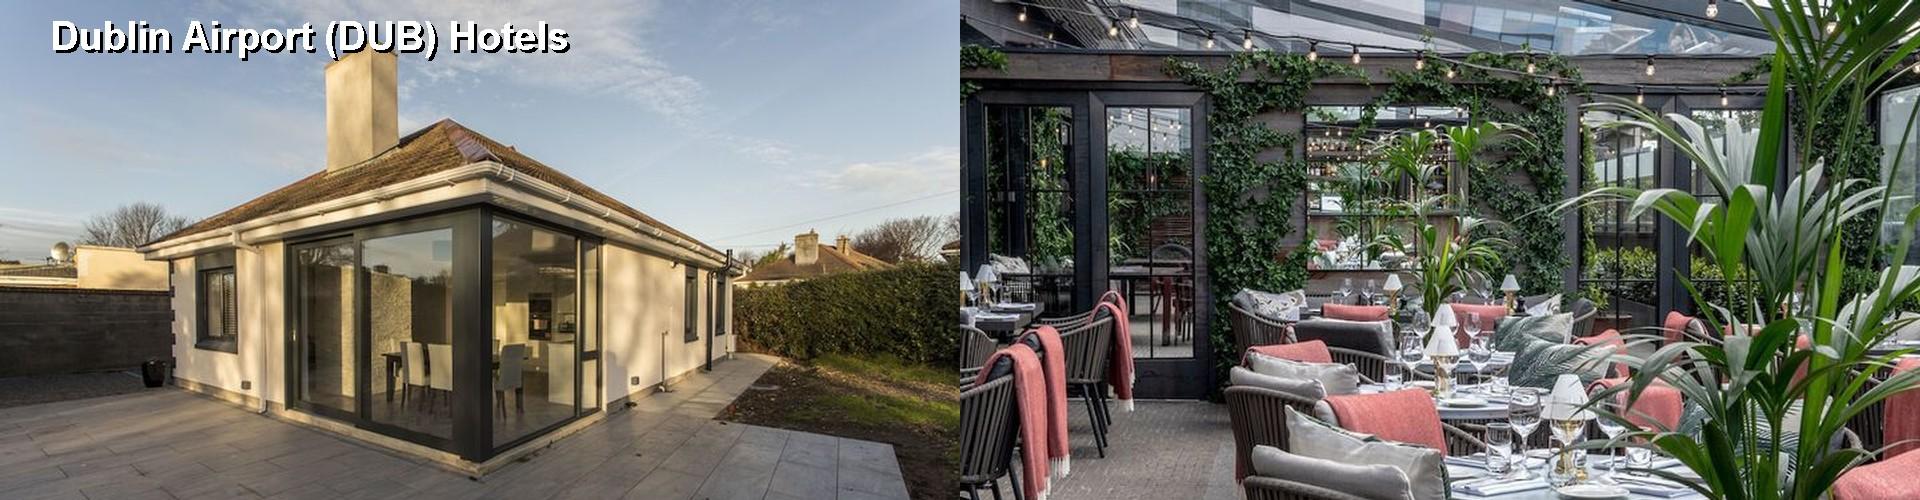 5 Best Hotels Near Dublin Airport Dub